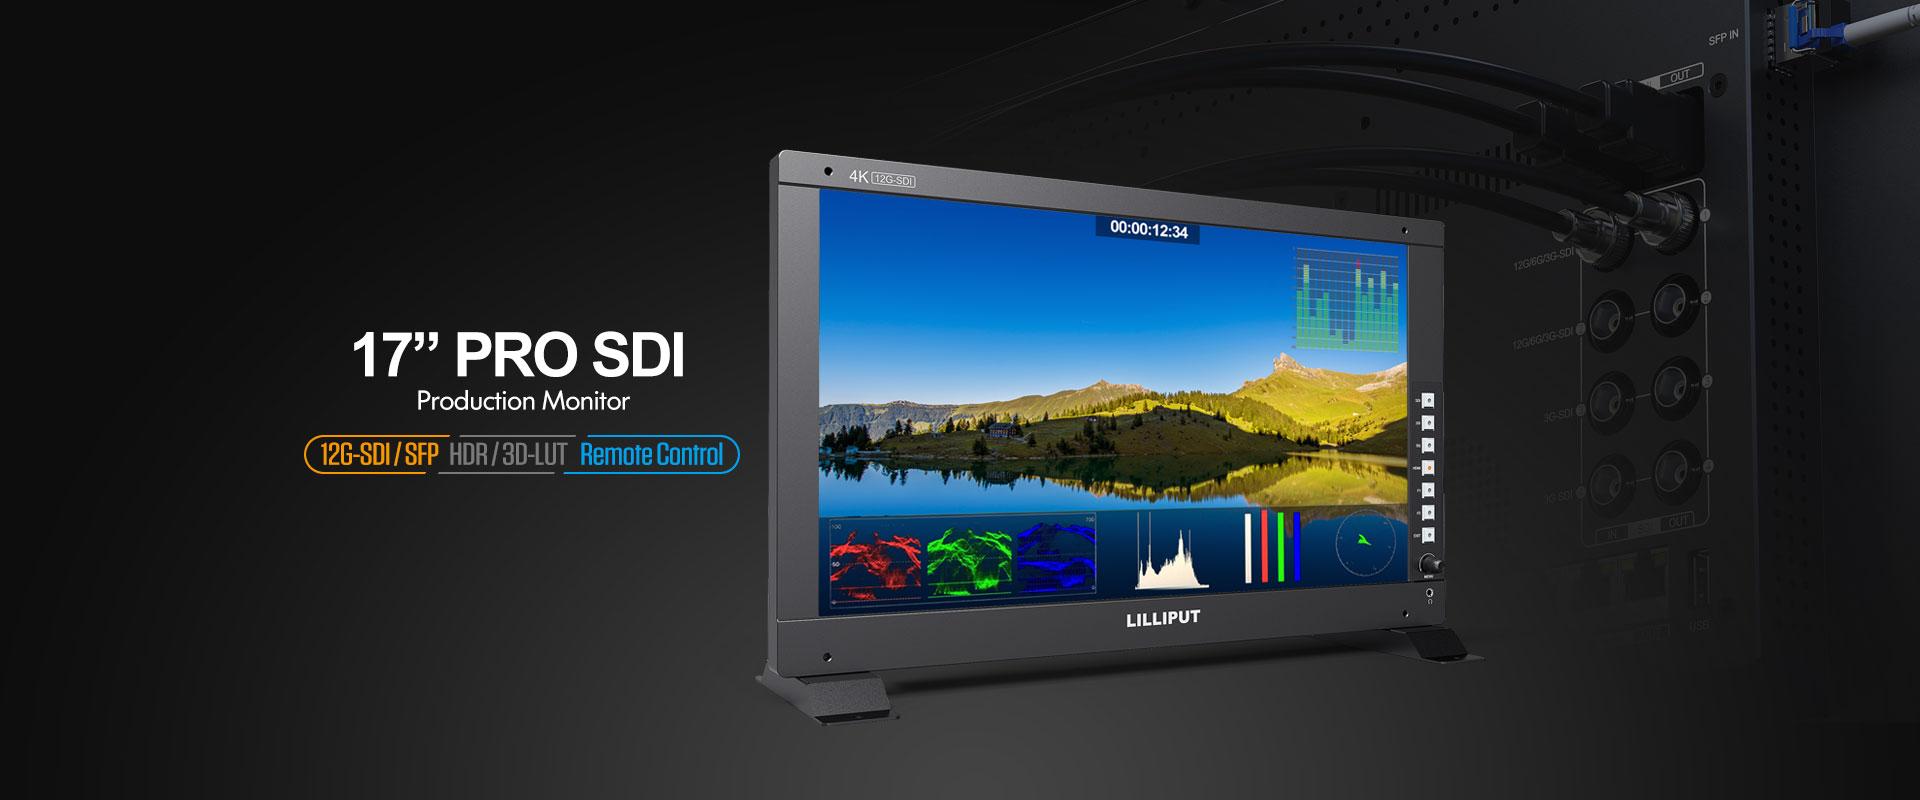 https://www.lilliput.com/q17-17-3-inch-12g-sdi-production-monitor-product/